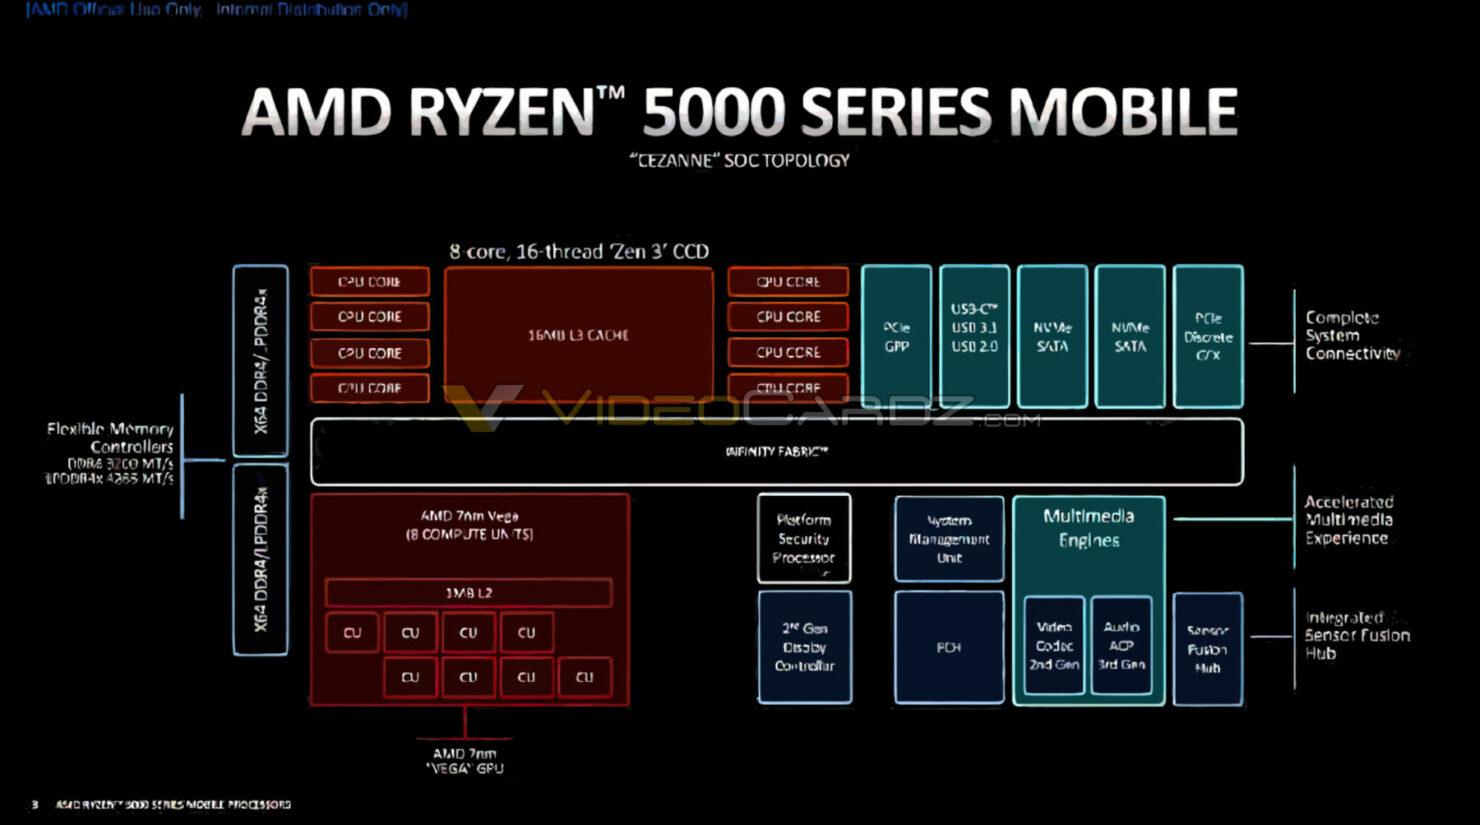 amd-ryzen-5000-mobile-diagram